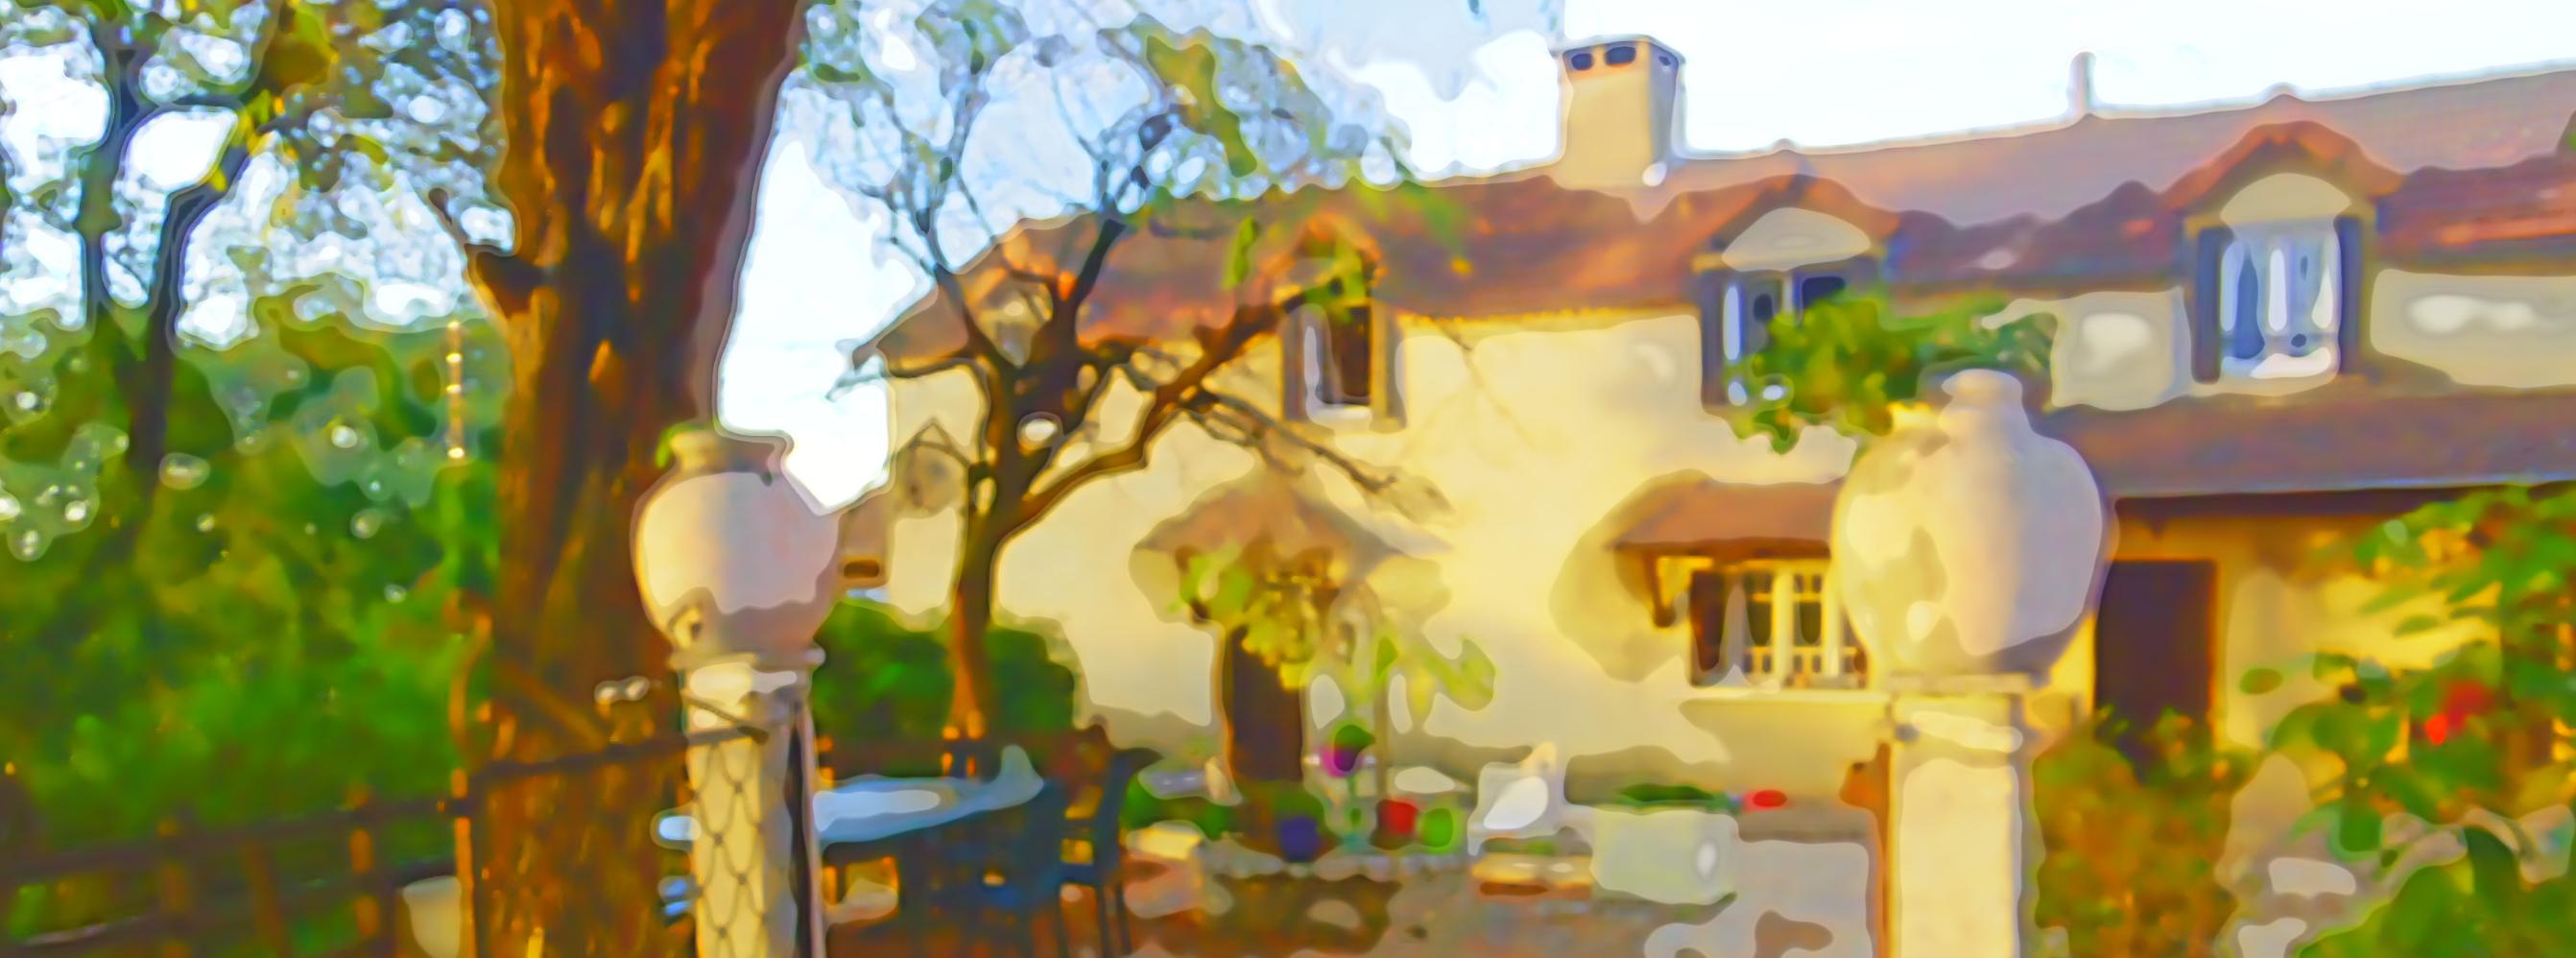 Les Meulières Chambres d'hôtes en Périgord Noir